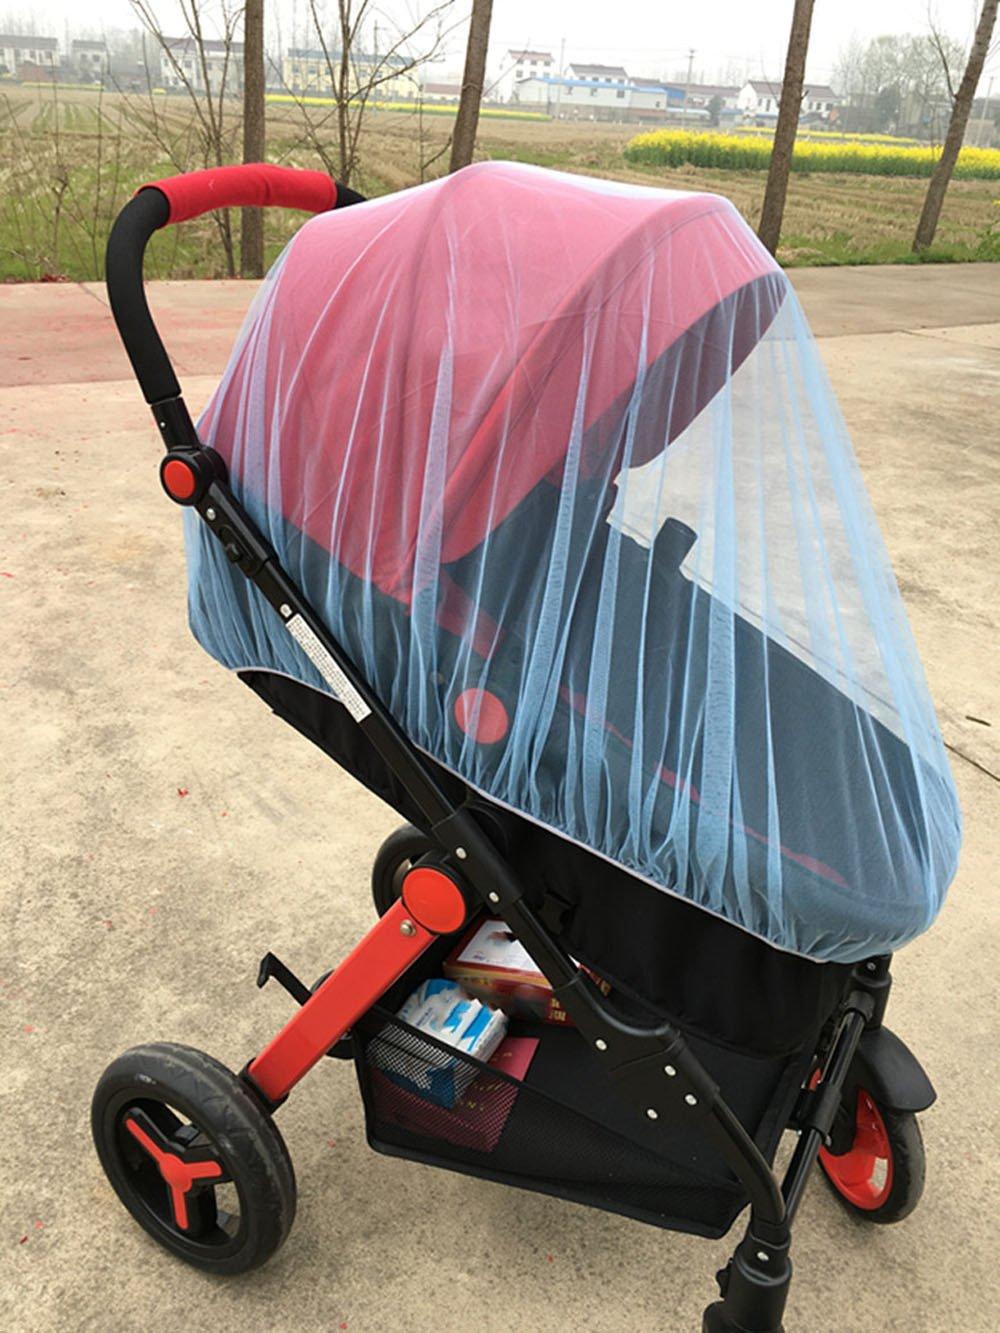 Birdfly Infant Baby Stroller Double Mosquito Net Bug